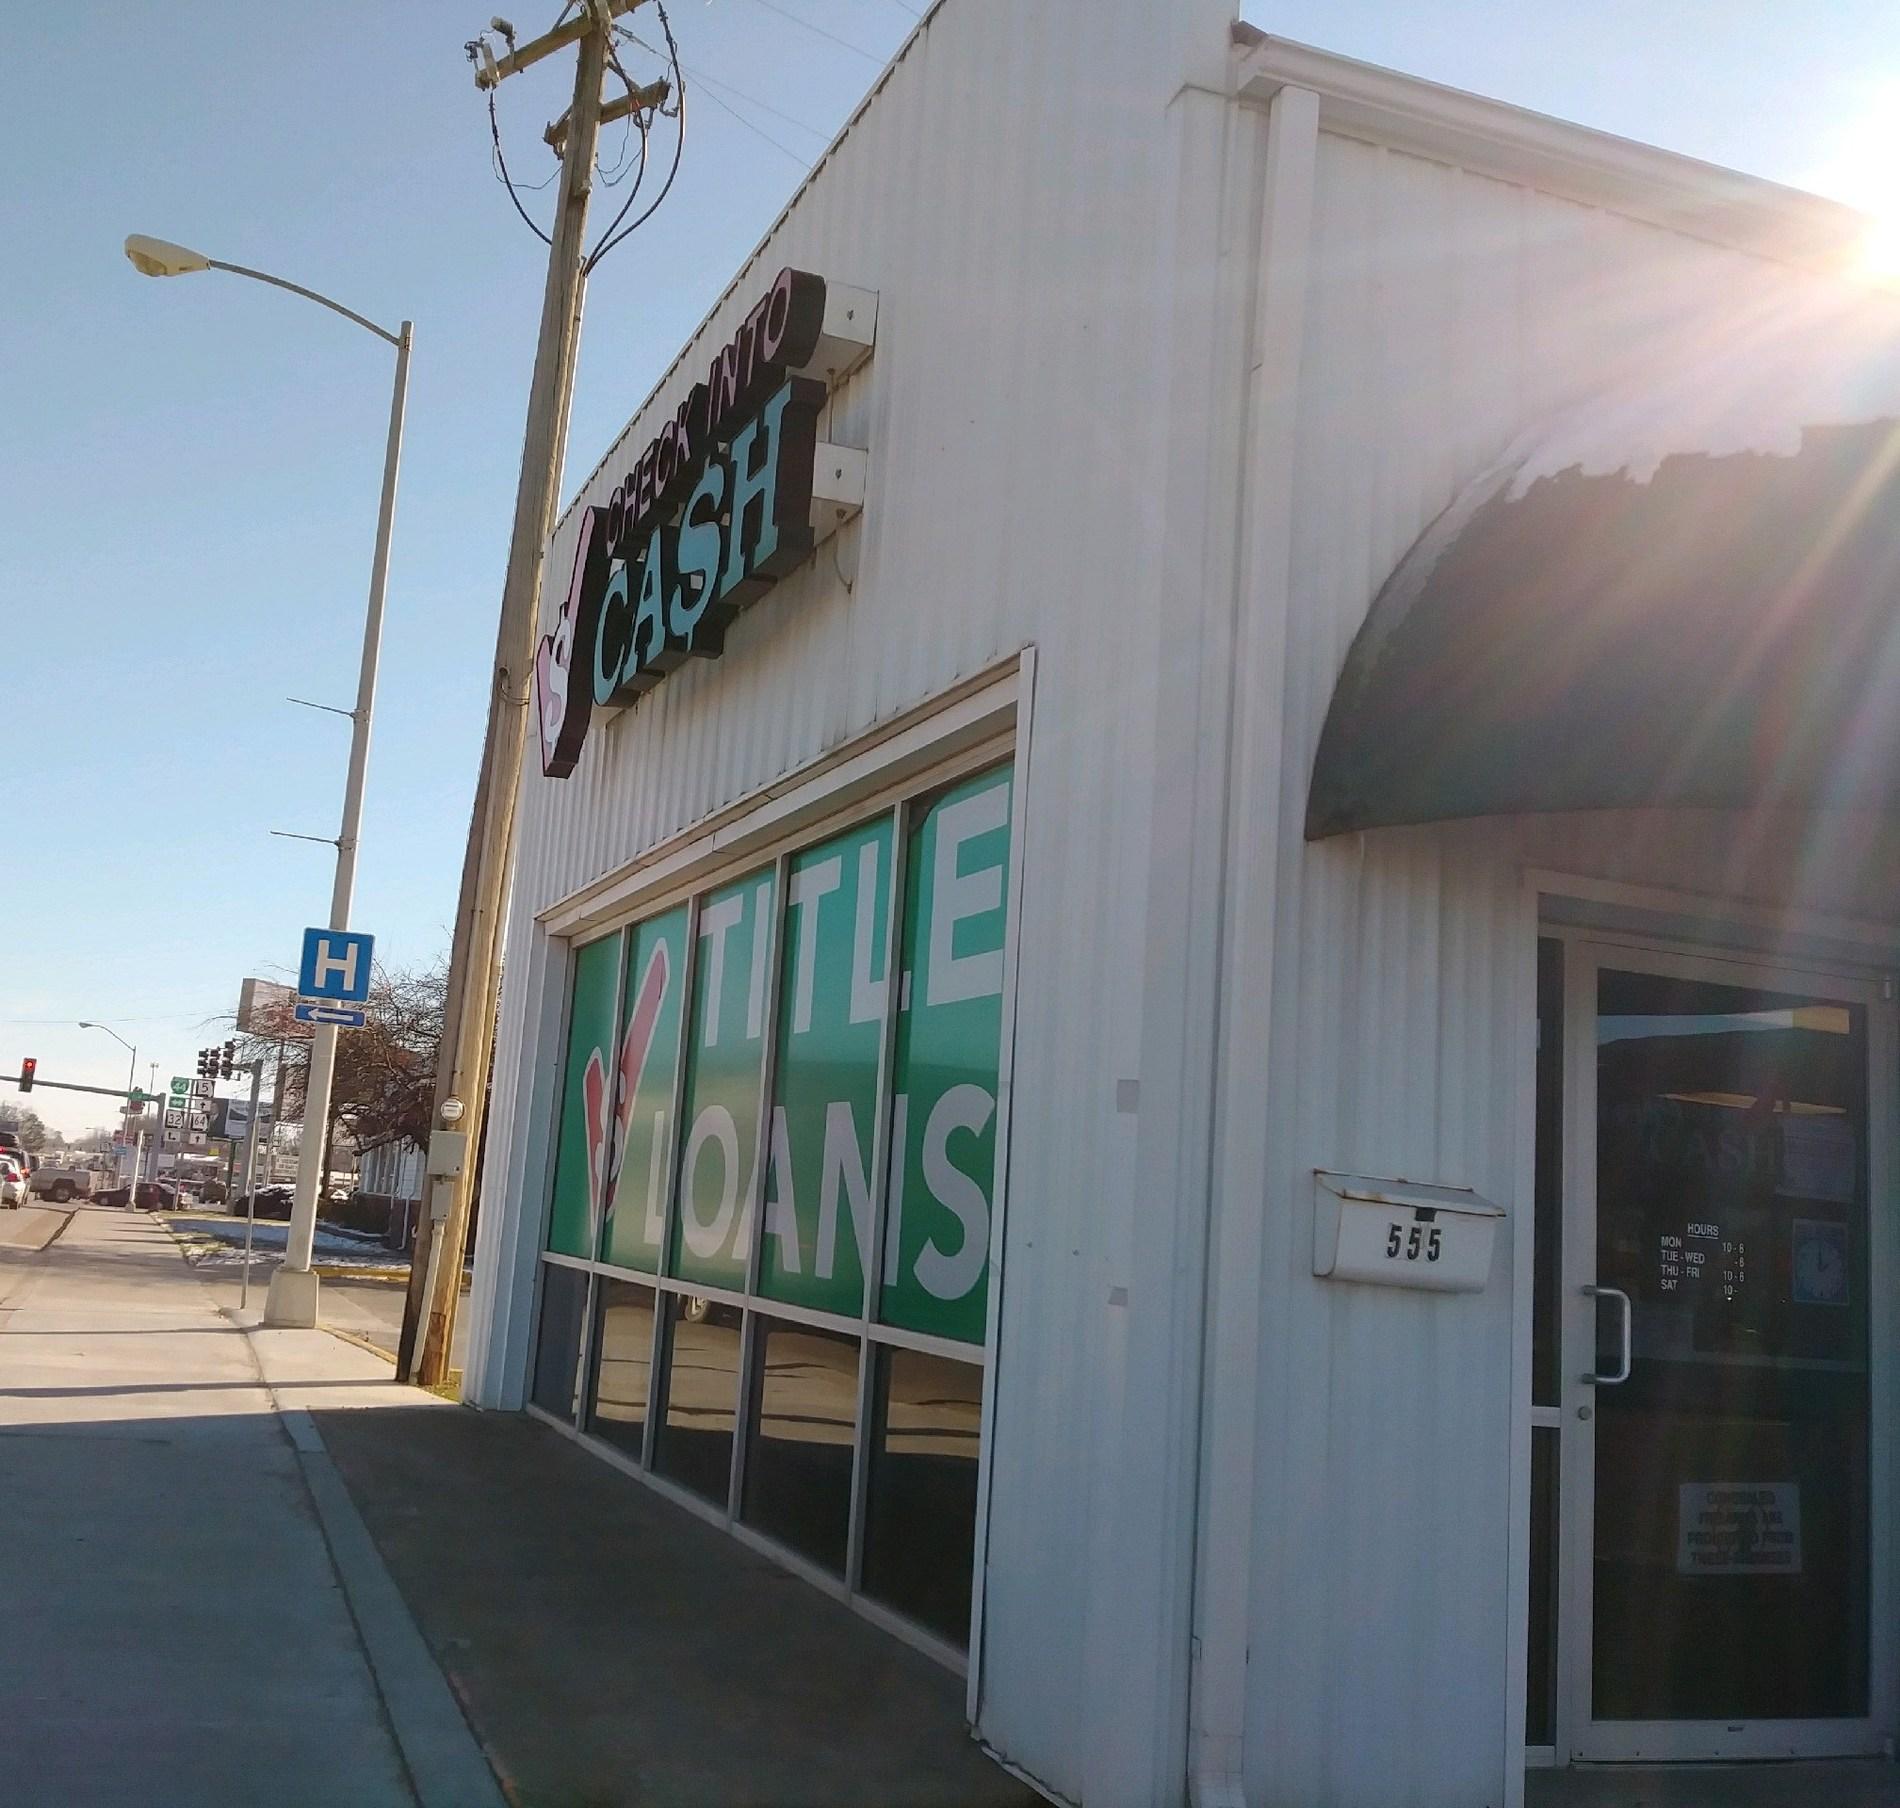 Cash loans in romeoville il image 6